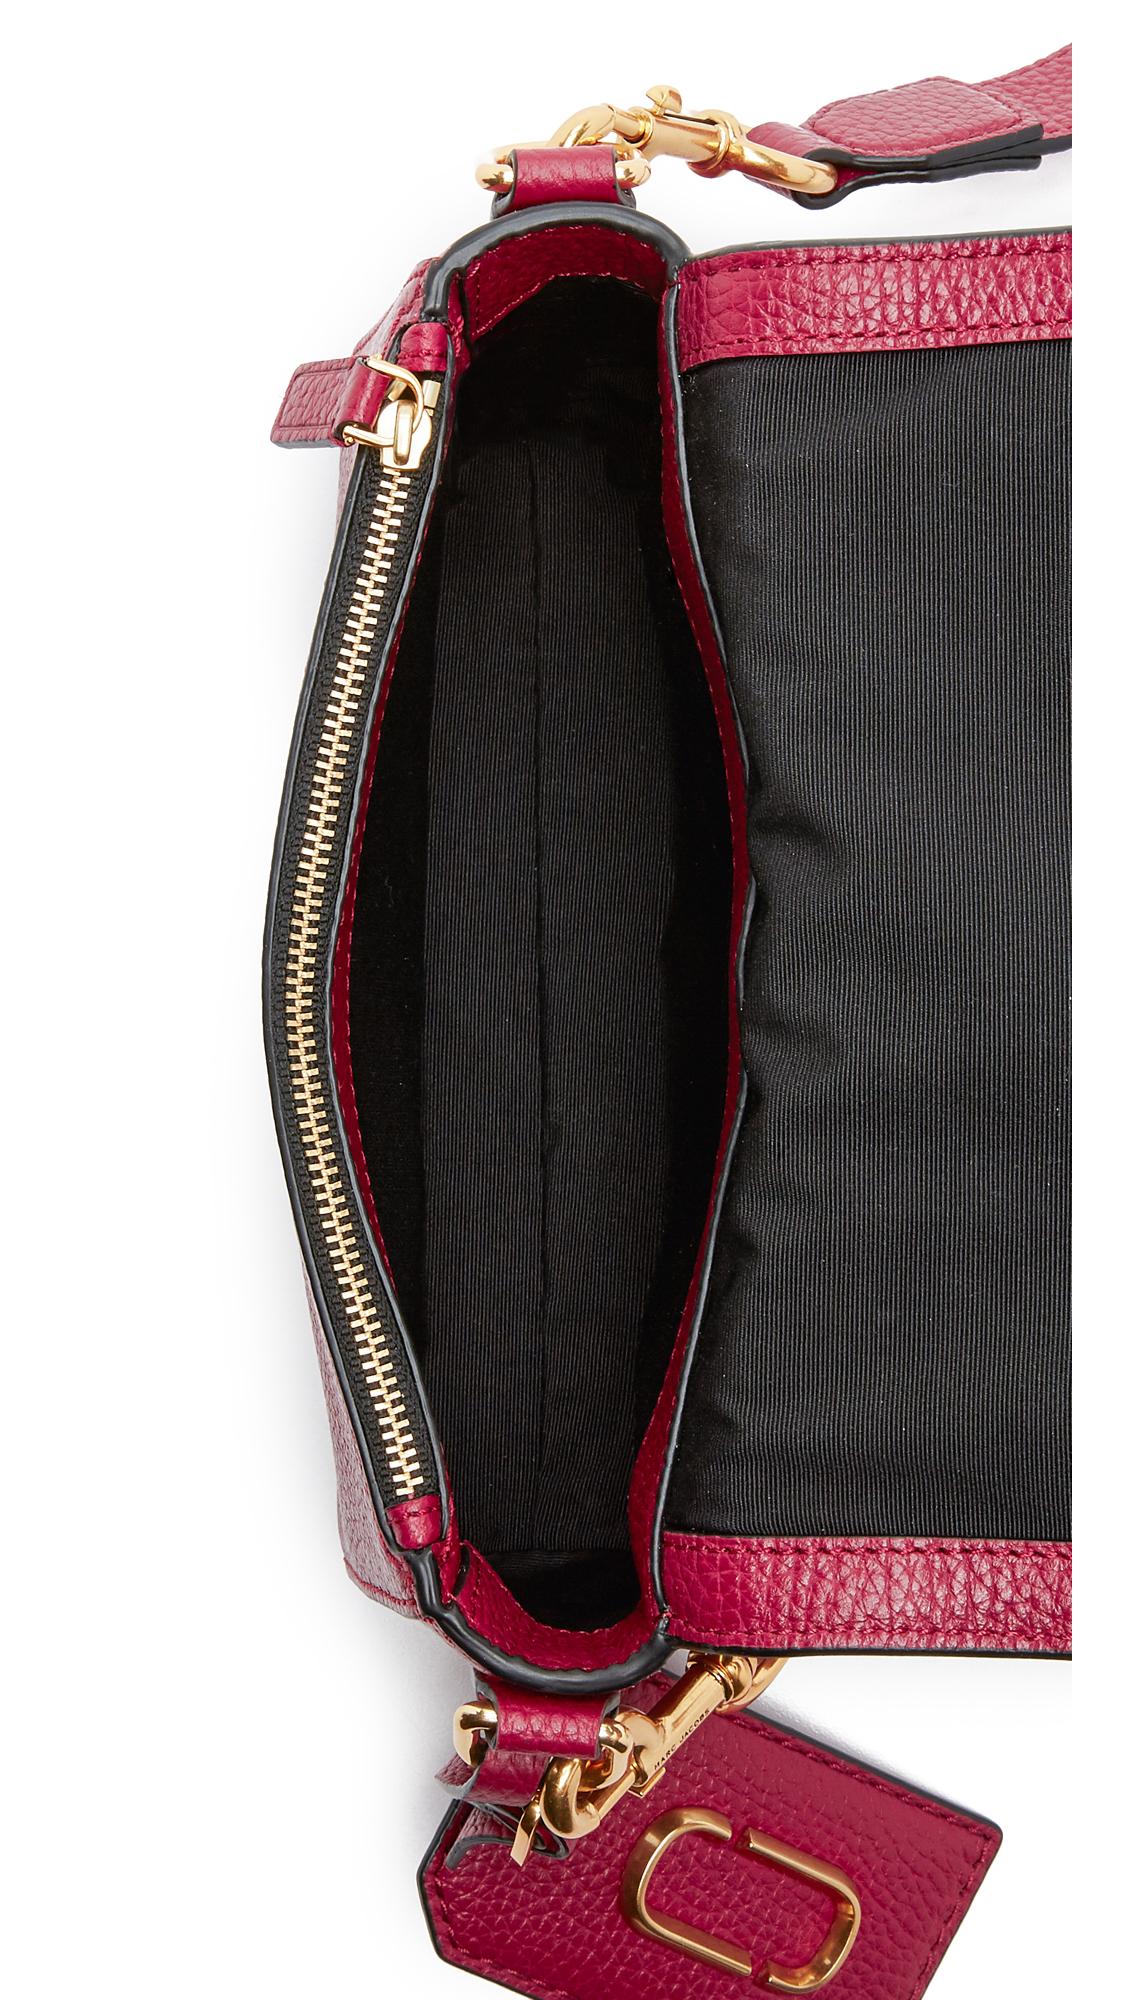 Marc Jacobs Leather Gotham City Cross Body Bag